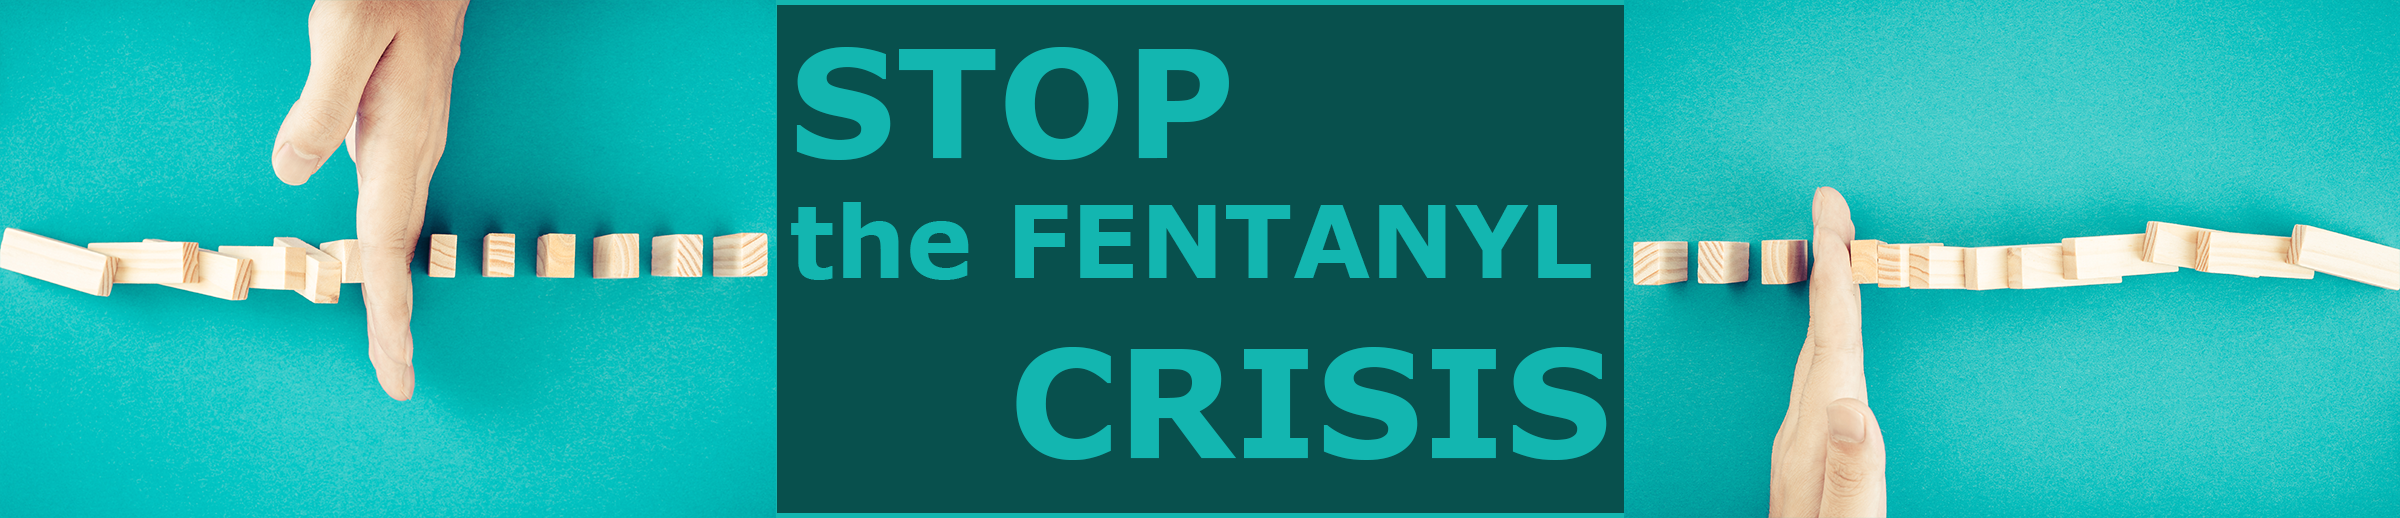 Fentanyl Crisis banner